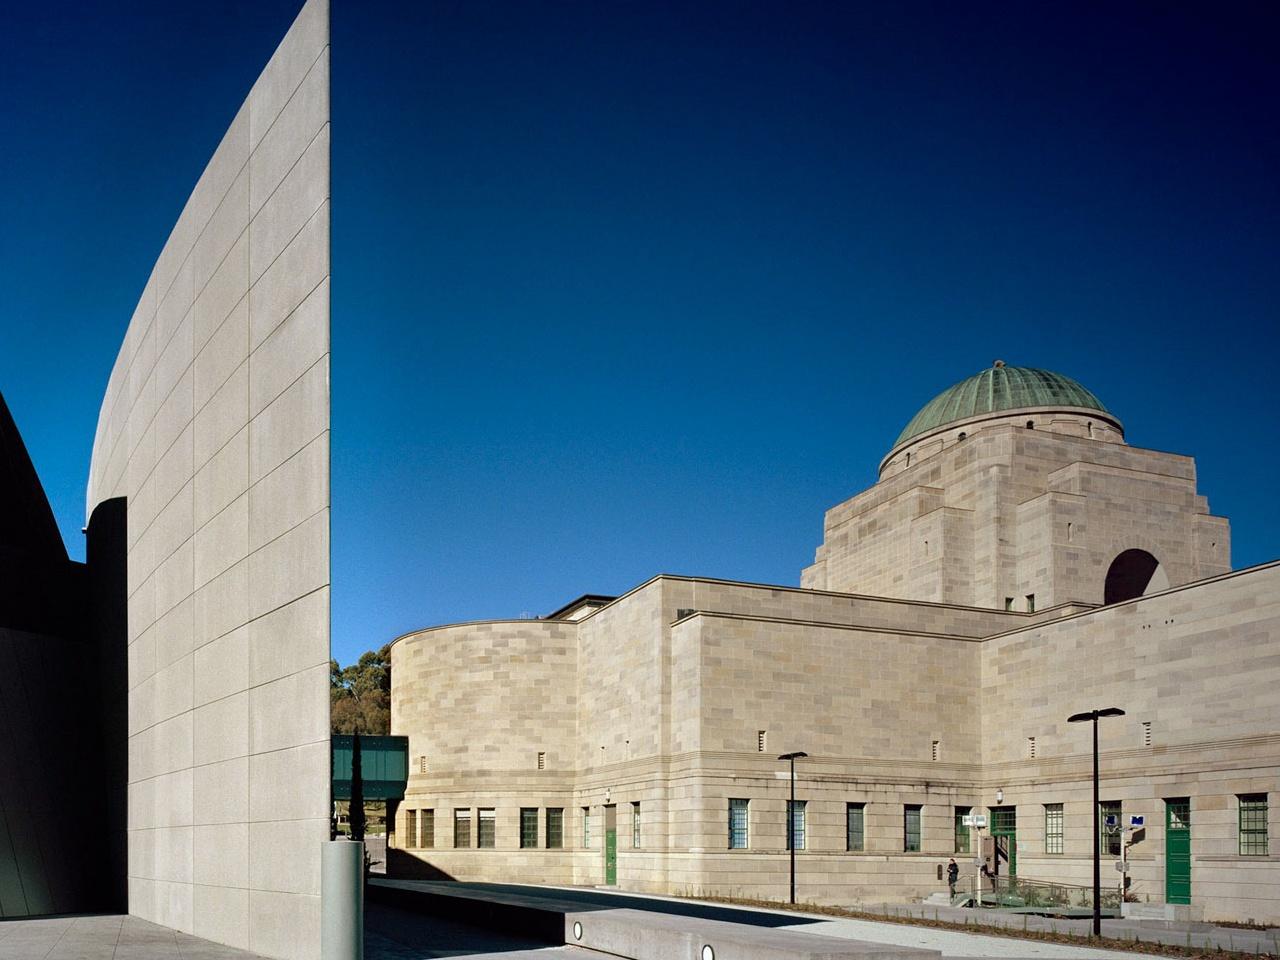 Australian Architects Condemn War Memorial Rebuild